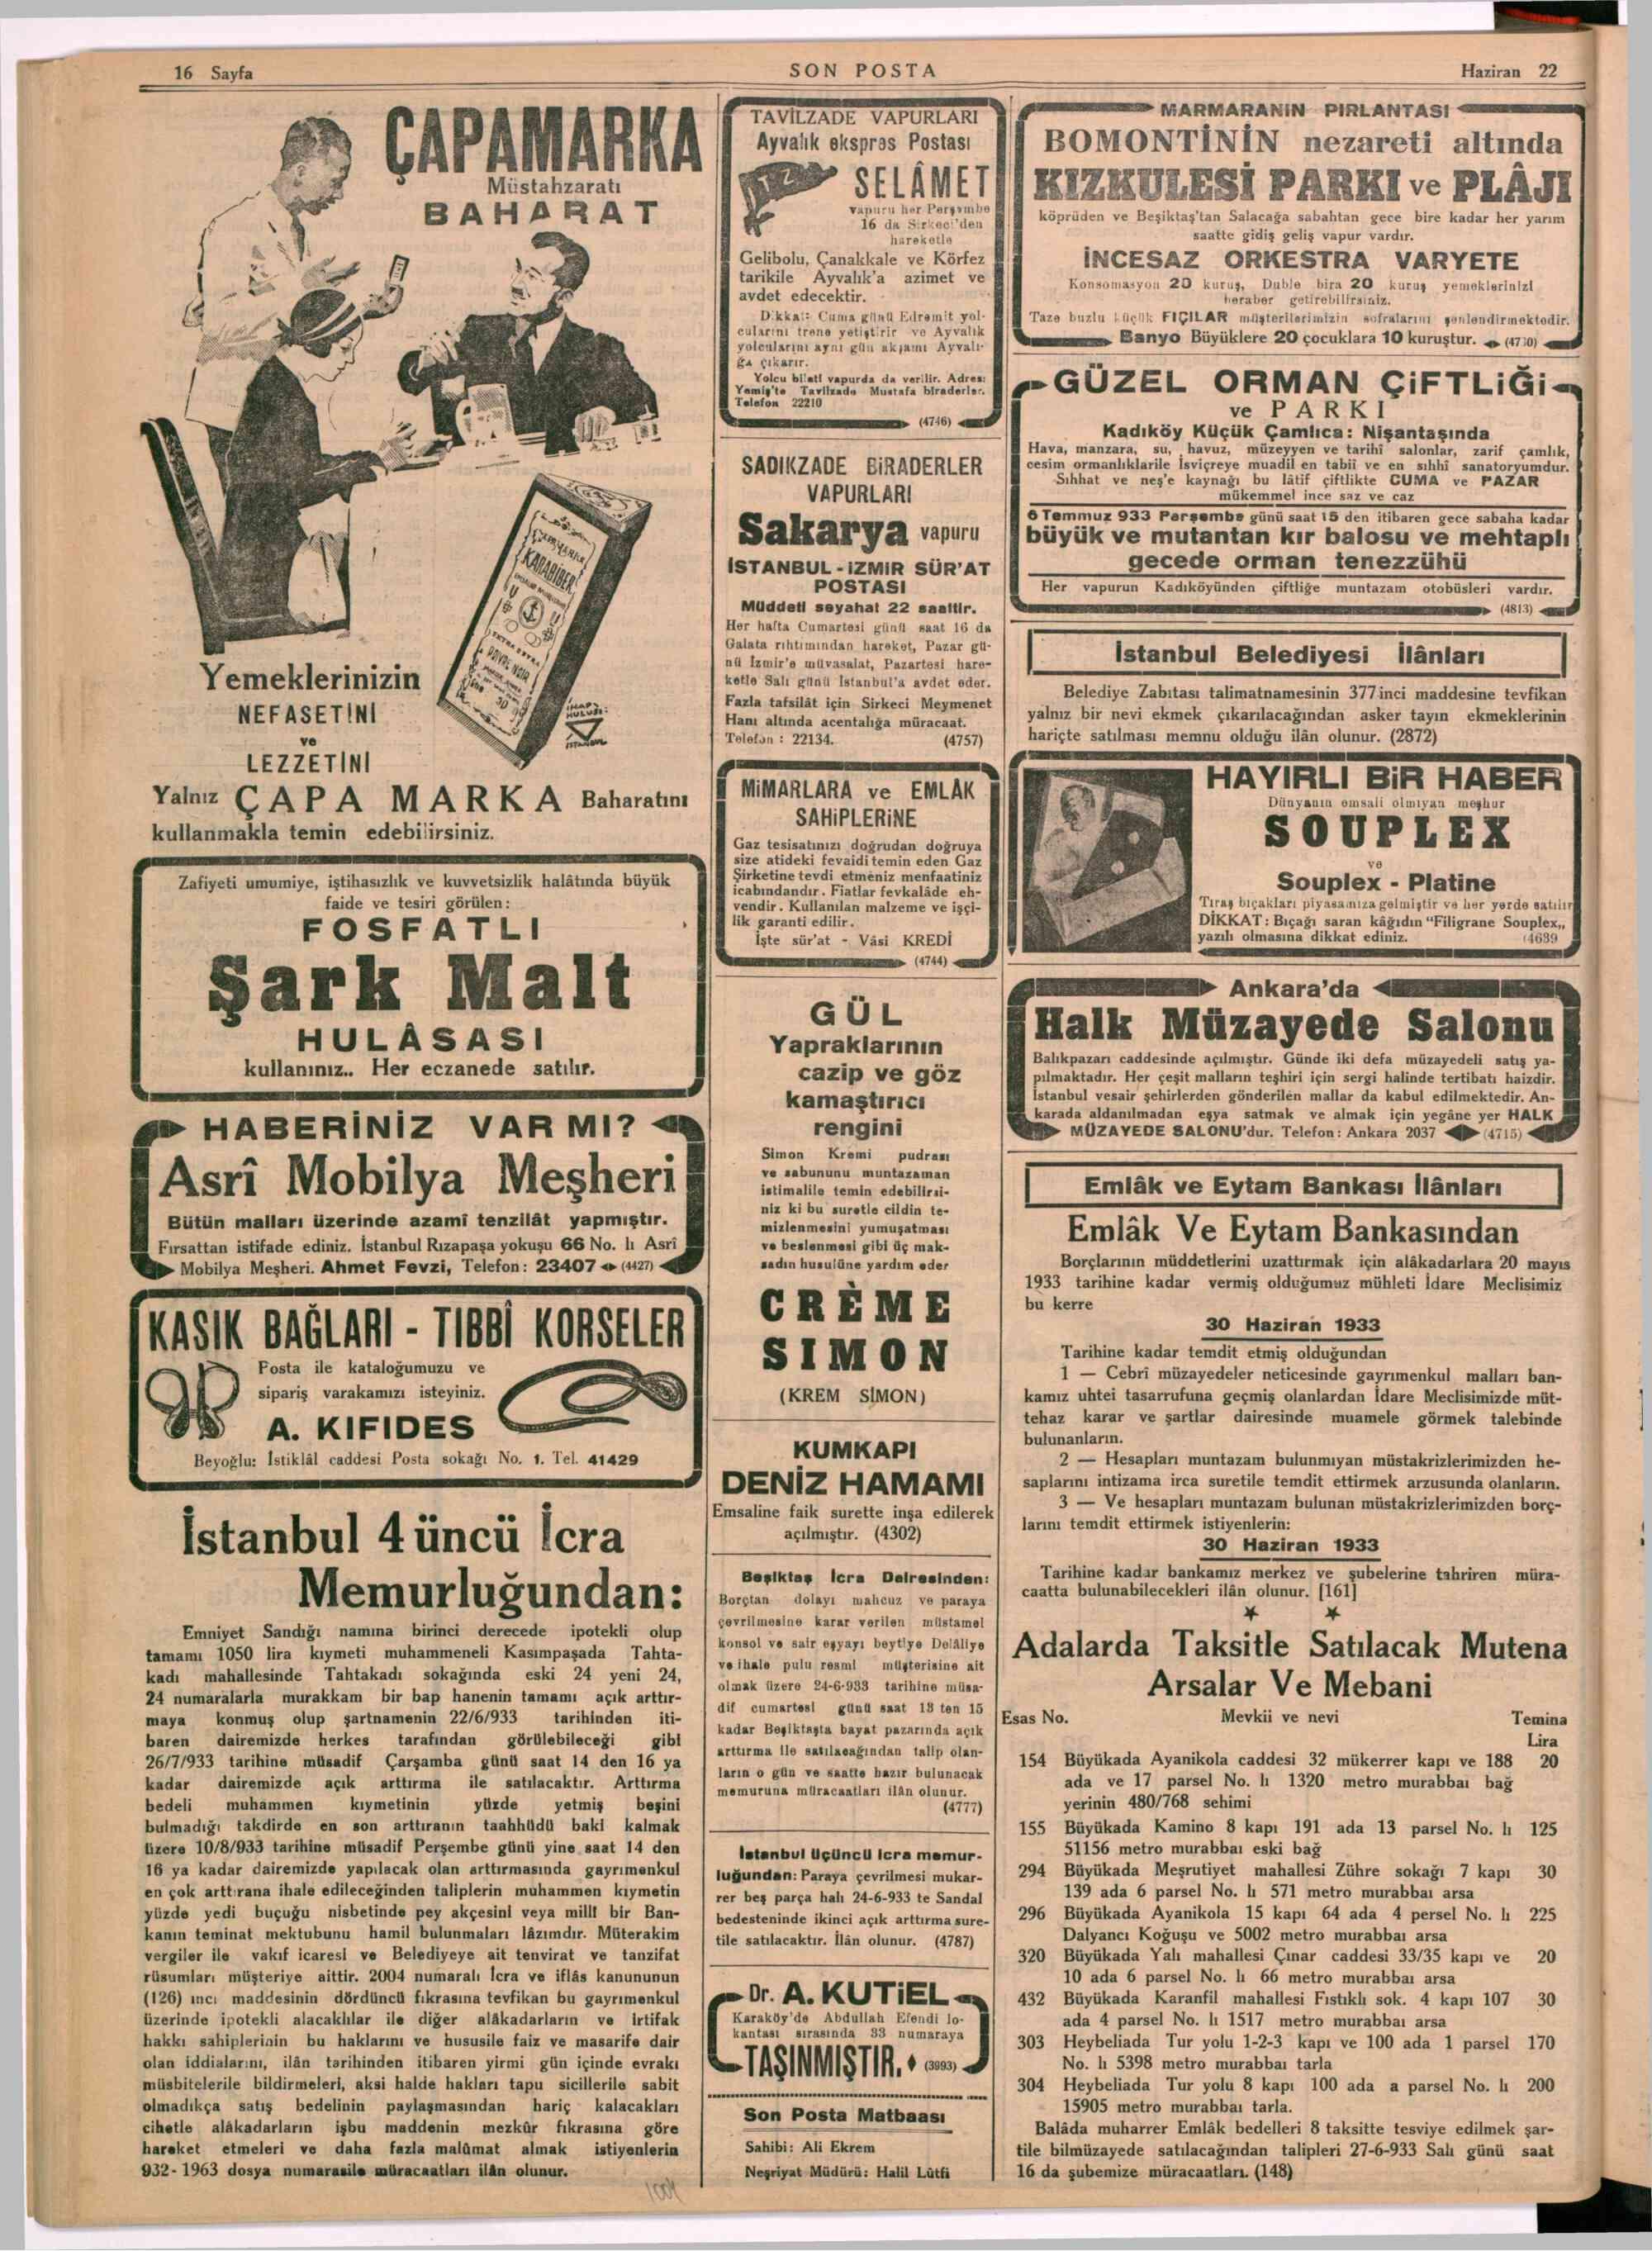 22 Haziran 1933 Tarihli Son Posta Dergisi Sayfa 16